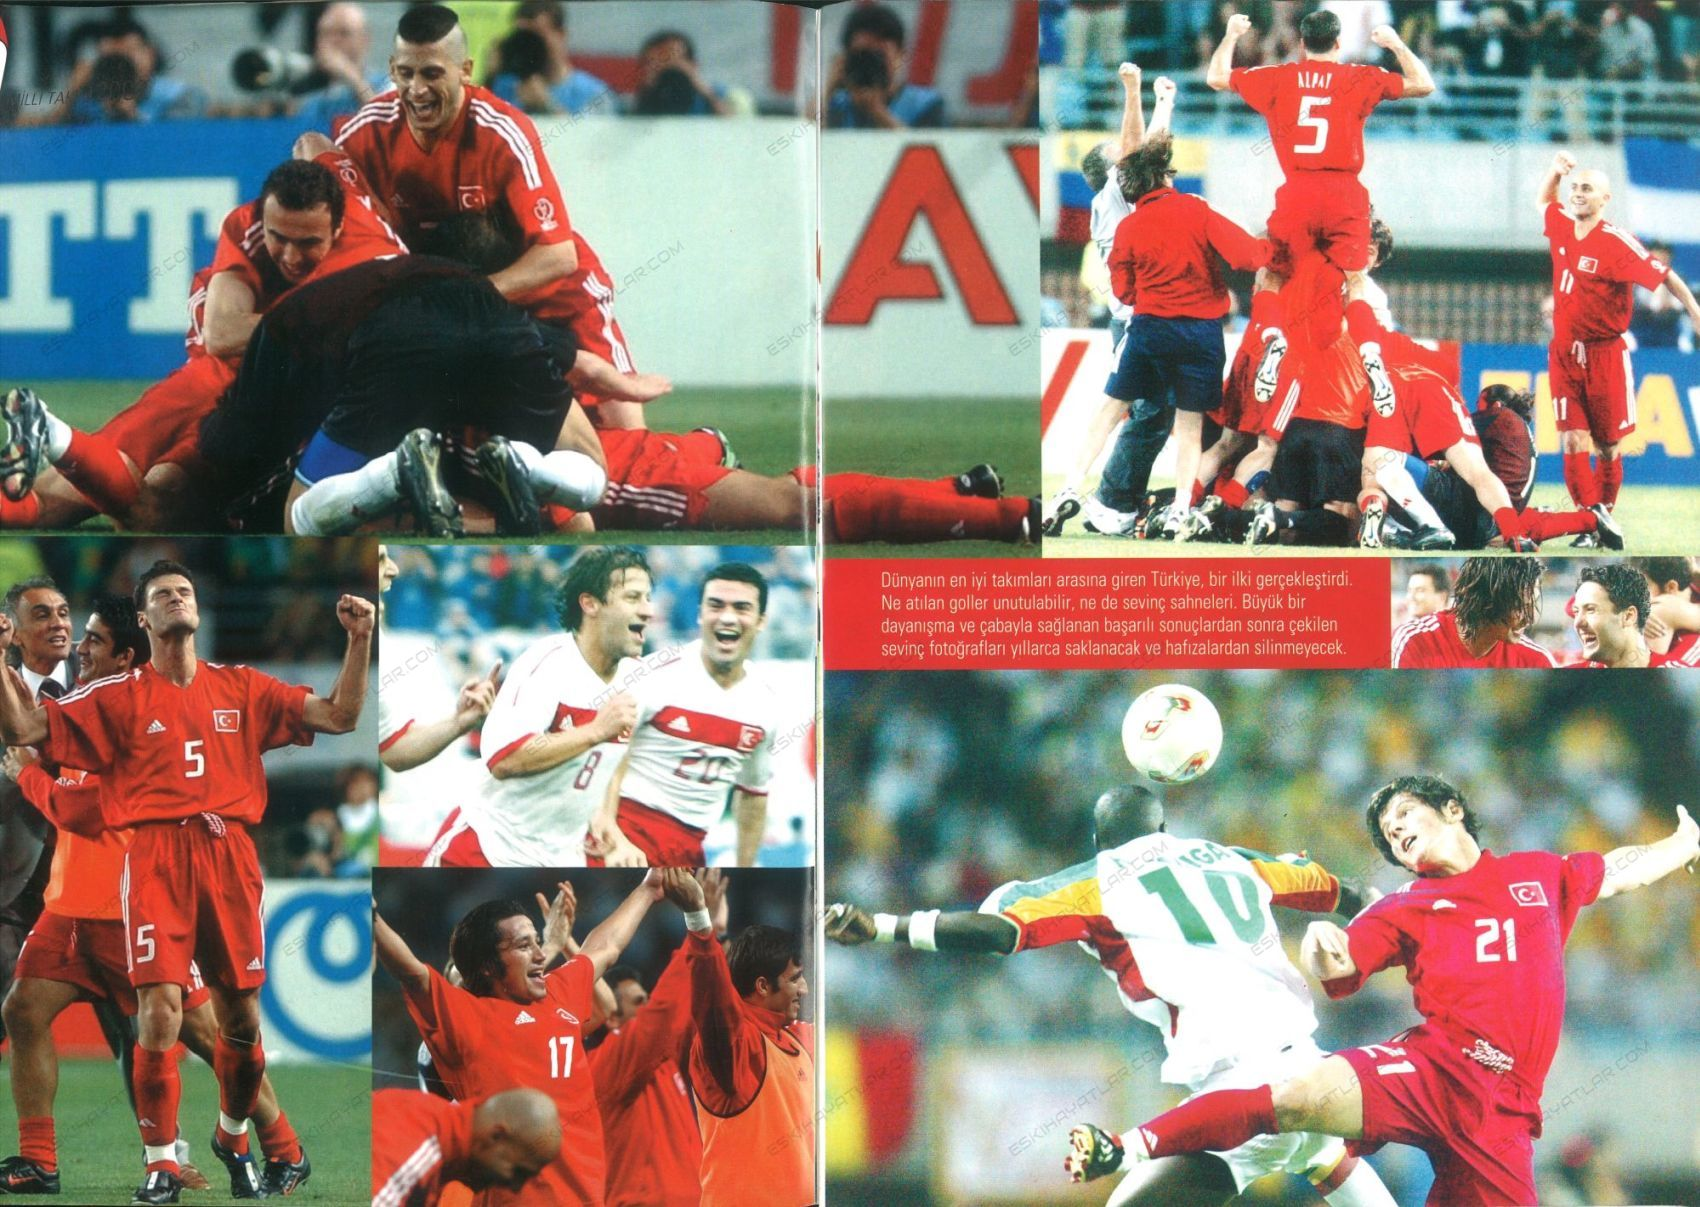 0406-turkiye-a-milli-takimi-2002-dunya-kupasi-kadrosu-aktuel-dergisi (4)